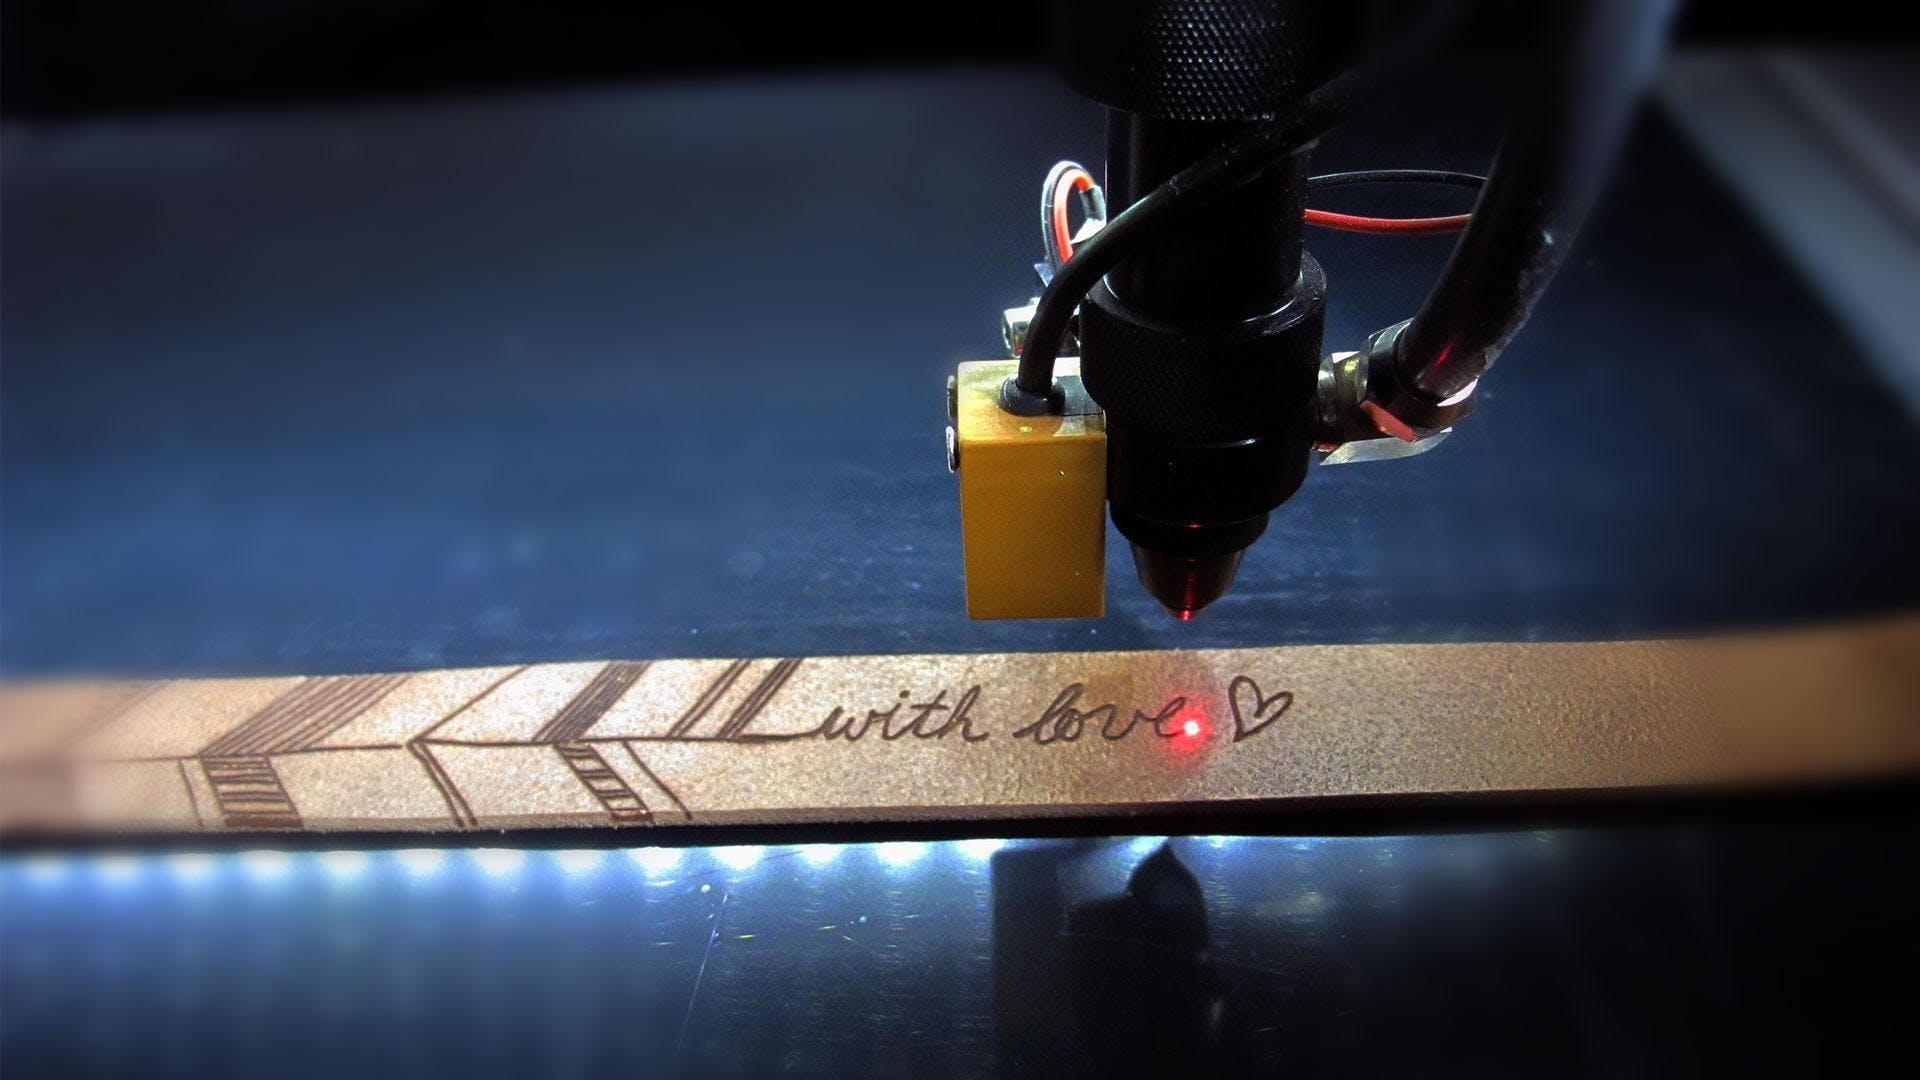 Laser Cutter / Engraver Training